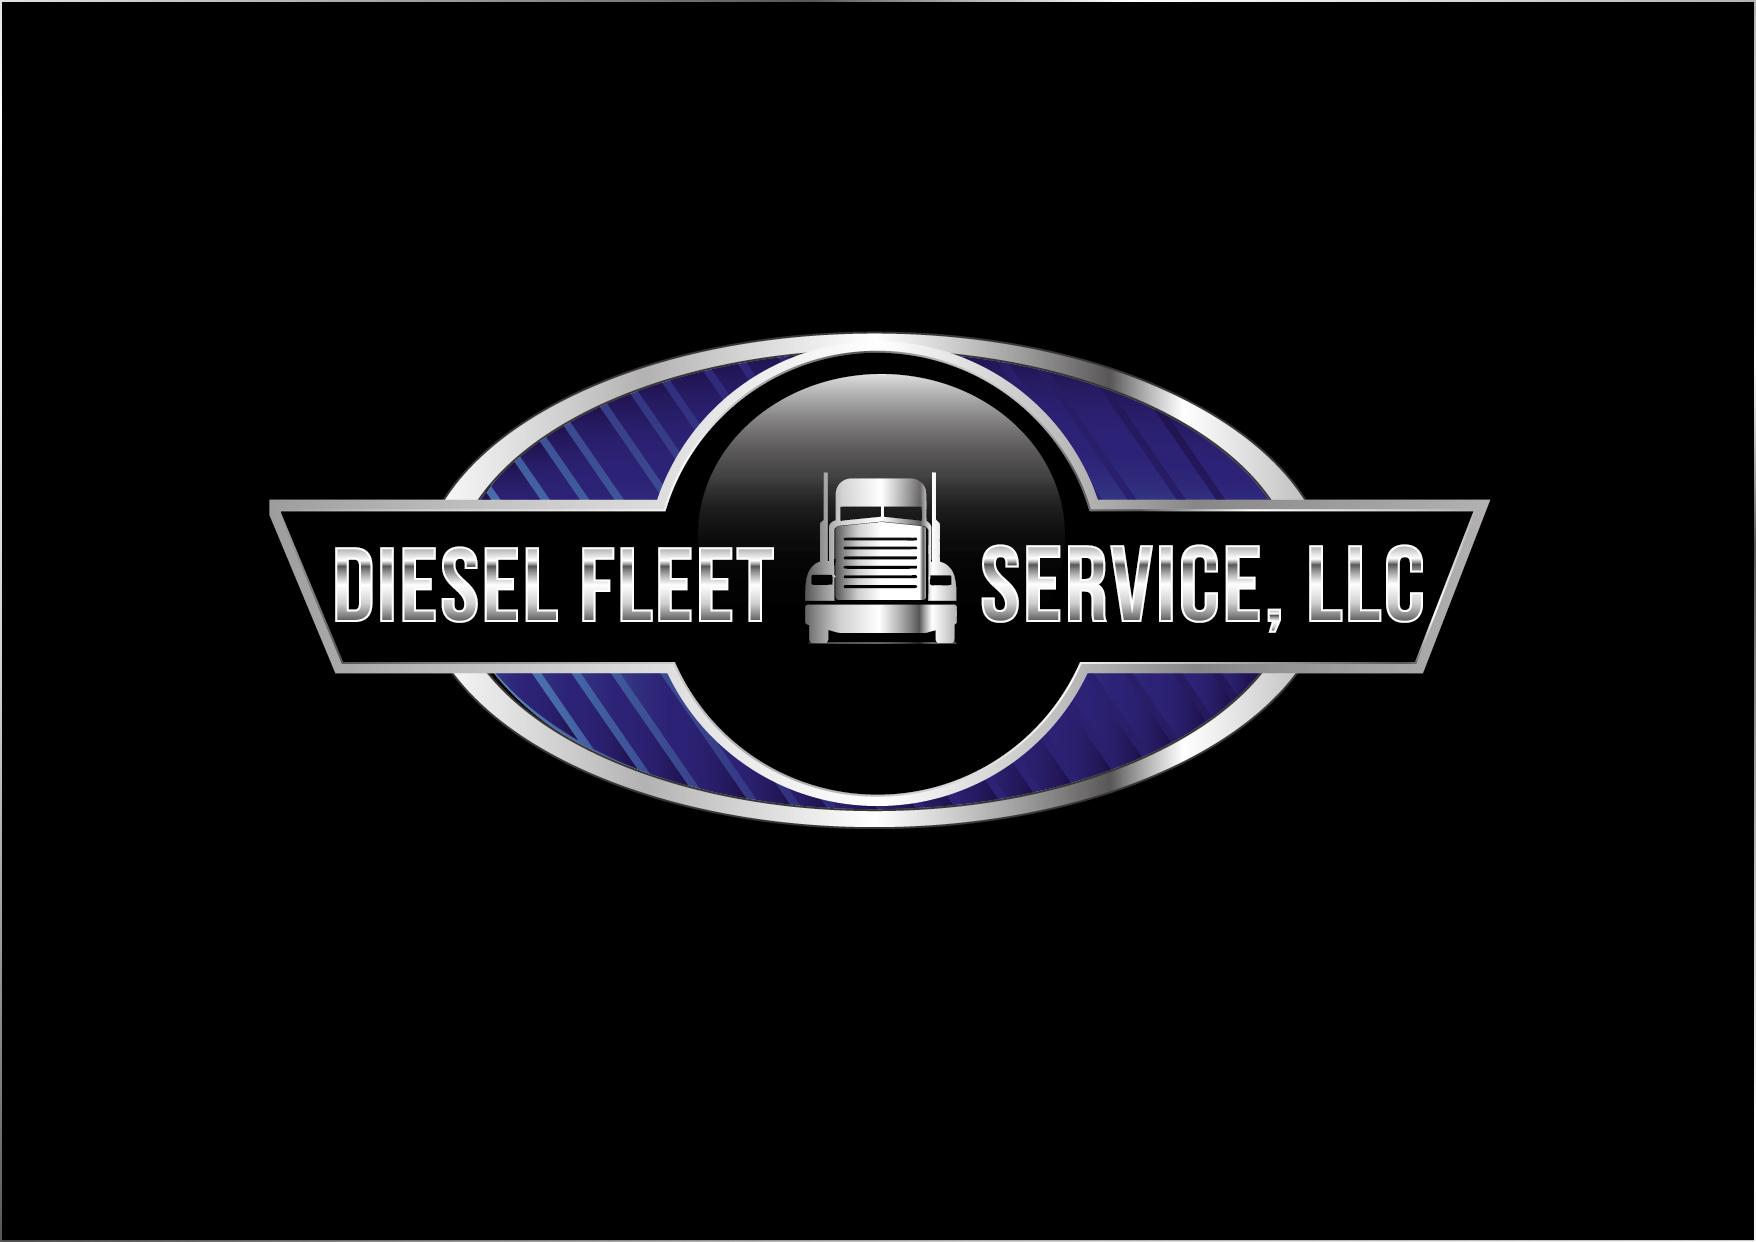 Logo Design by VENTSISLAV KOVACHEV - Entry No. 40 in the Logo Design Contest Artistic Logo Design for Diesel Fleet Service, LLC.